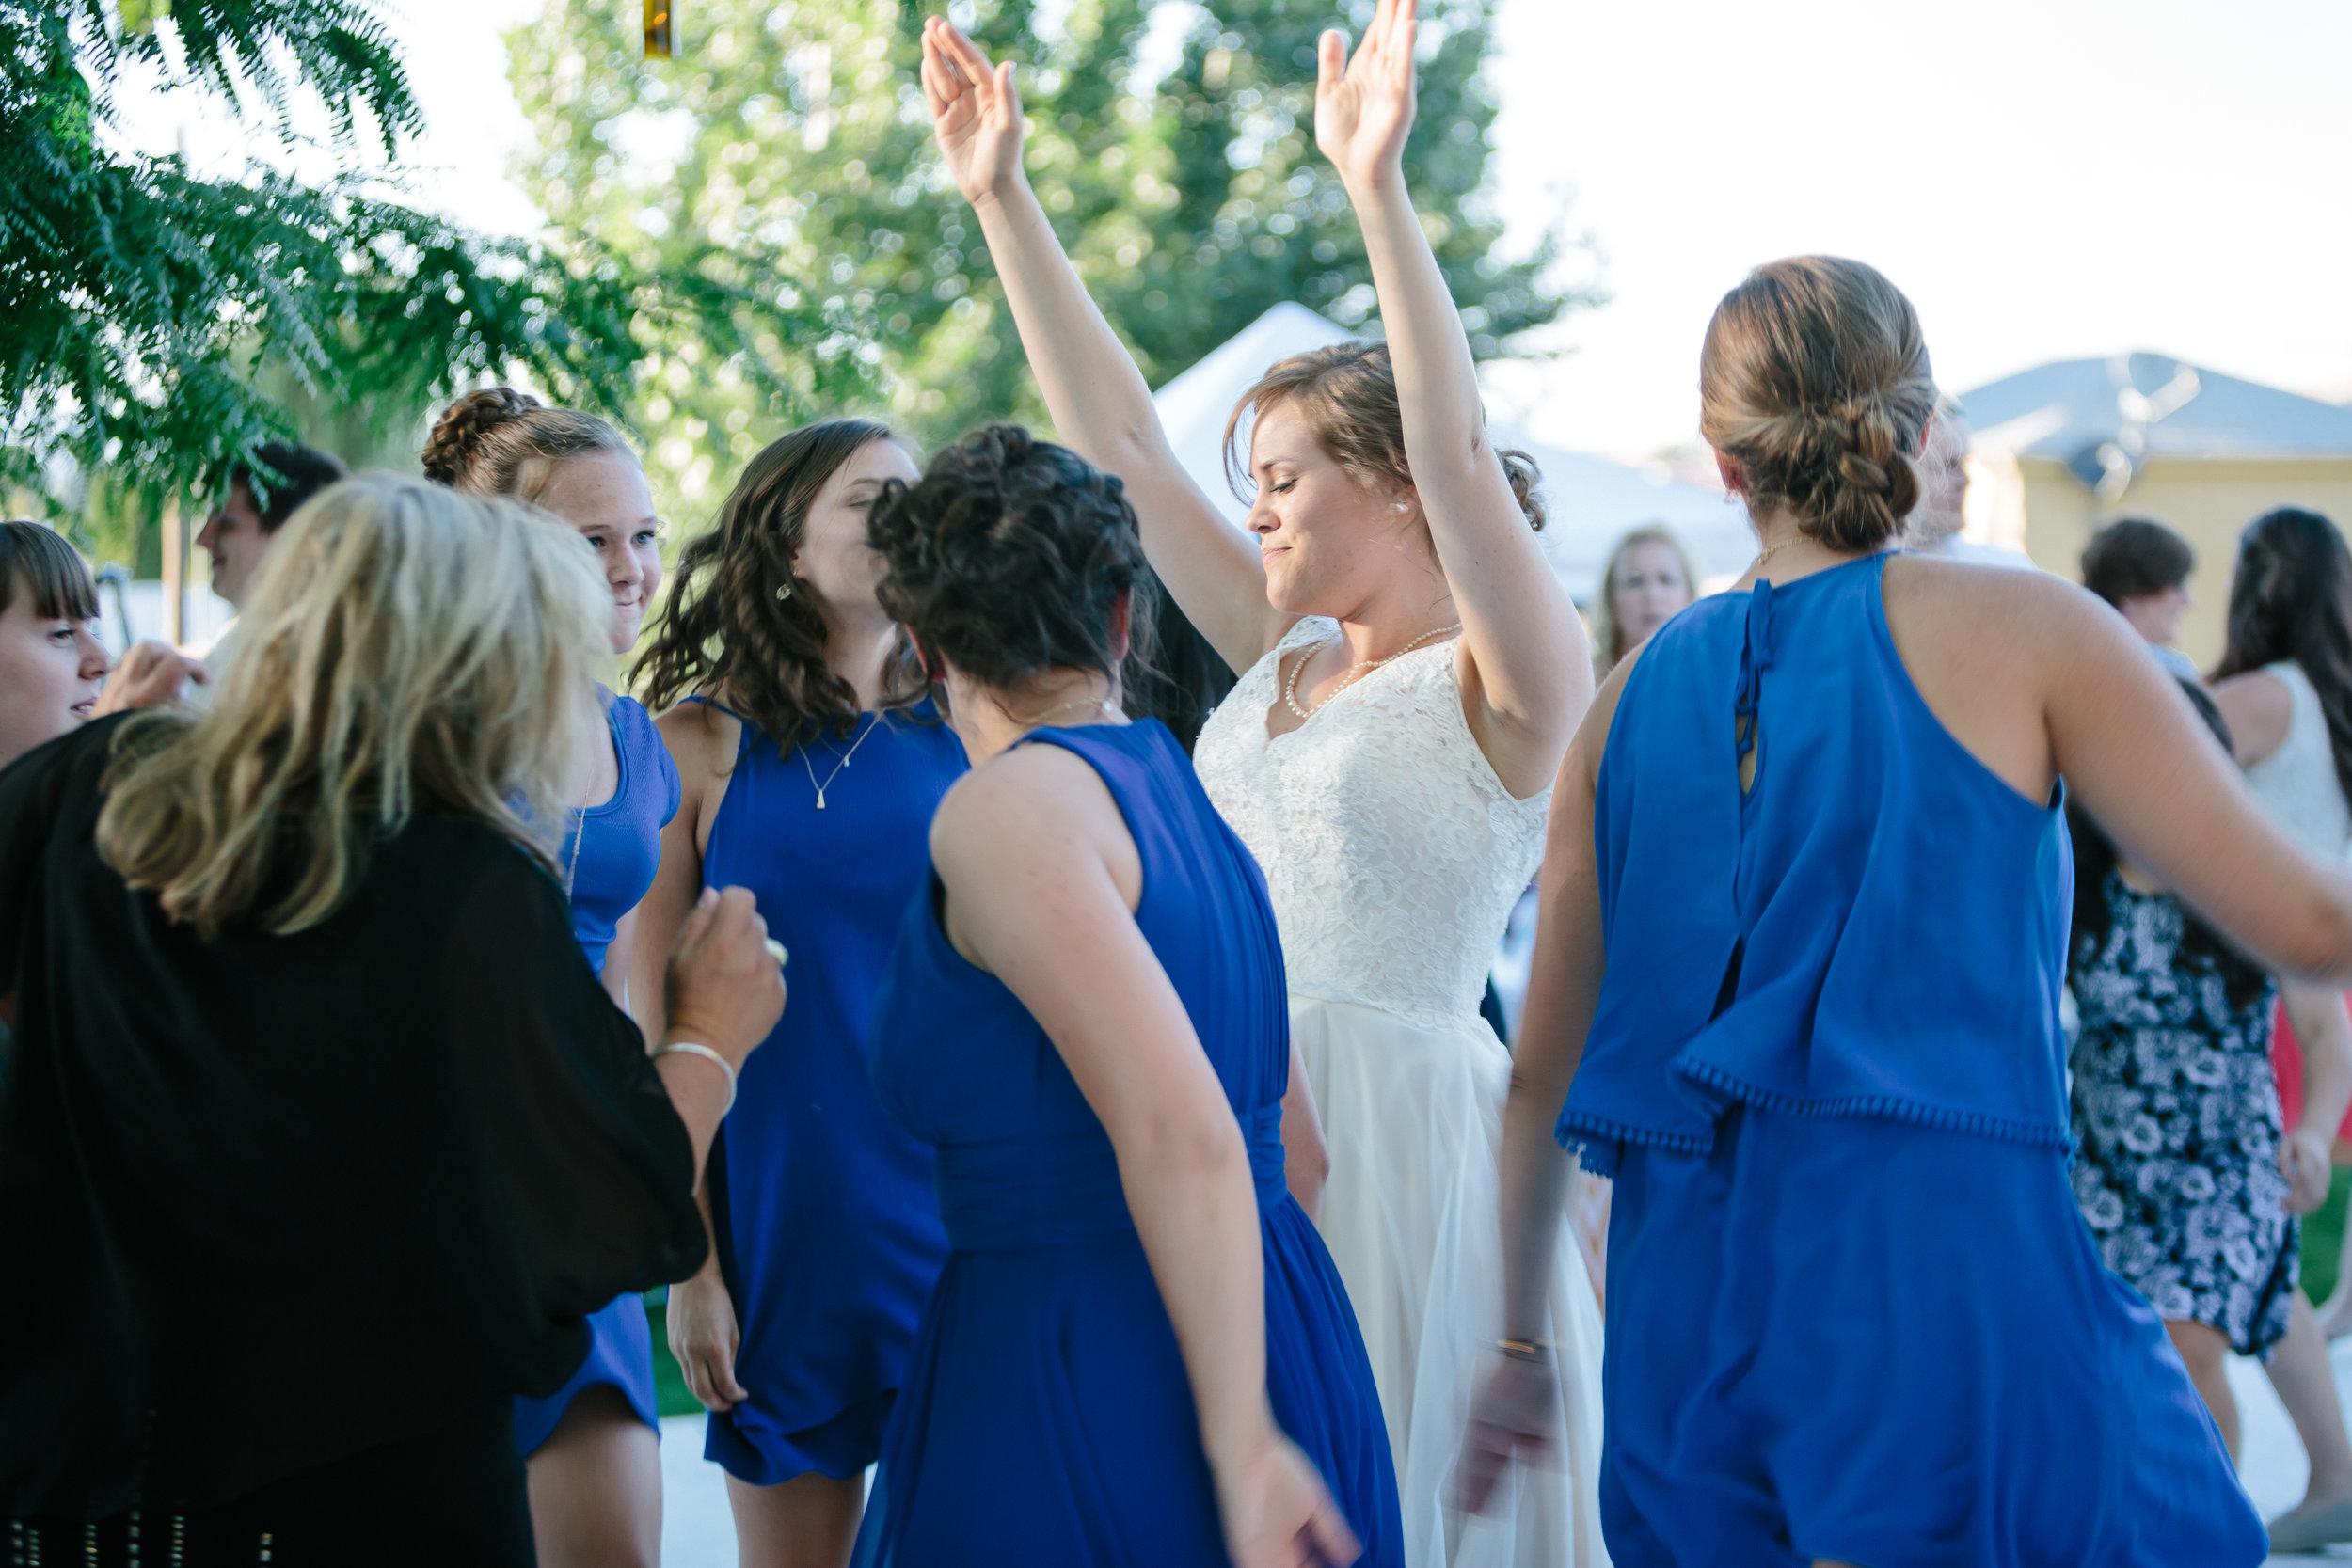 Jordan & Shantel Married - Idaho - Corrie Mick Photography-331.jpg